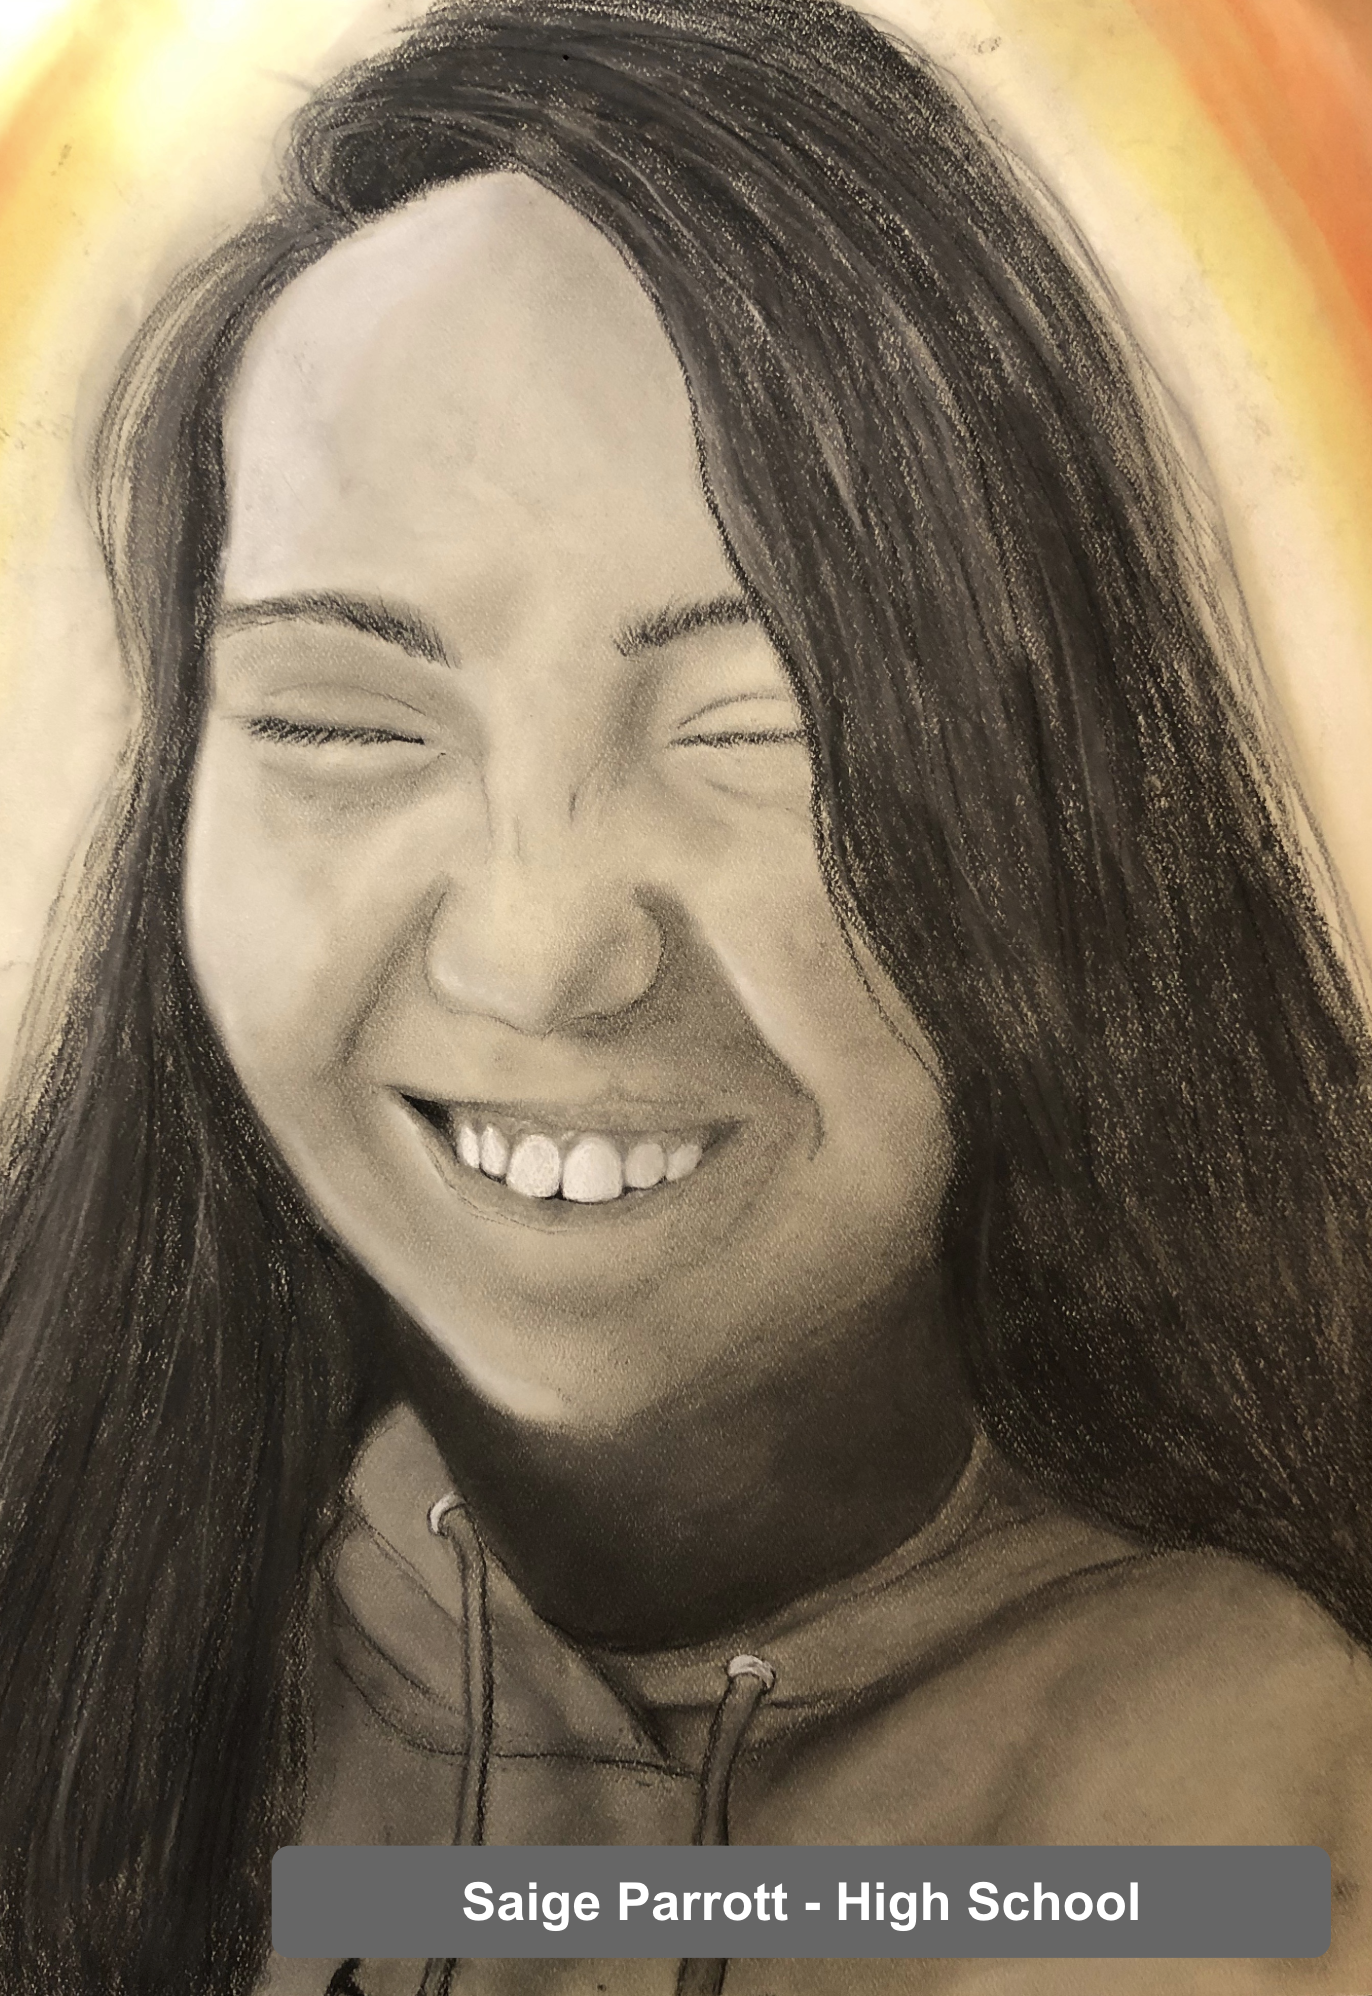 Saige Parrott - Art Project - High School